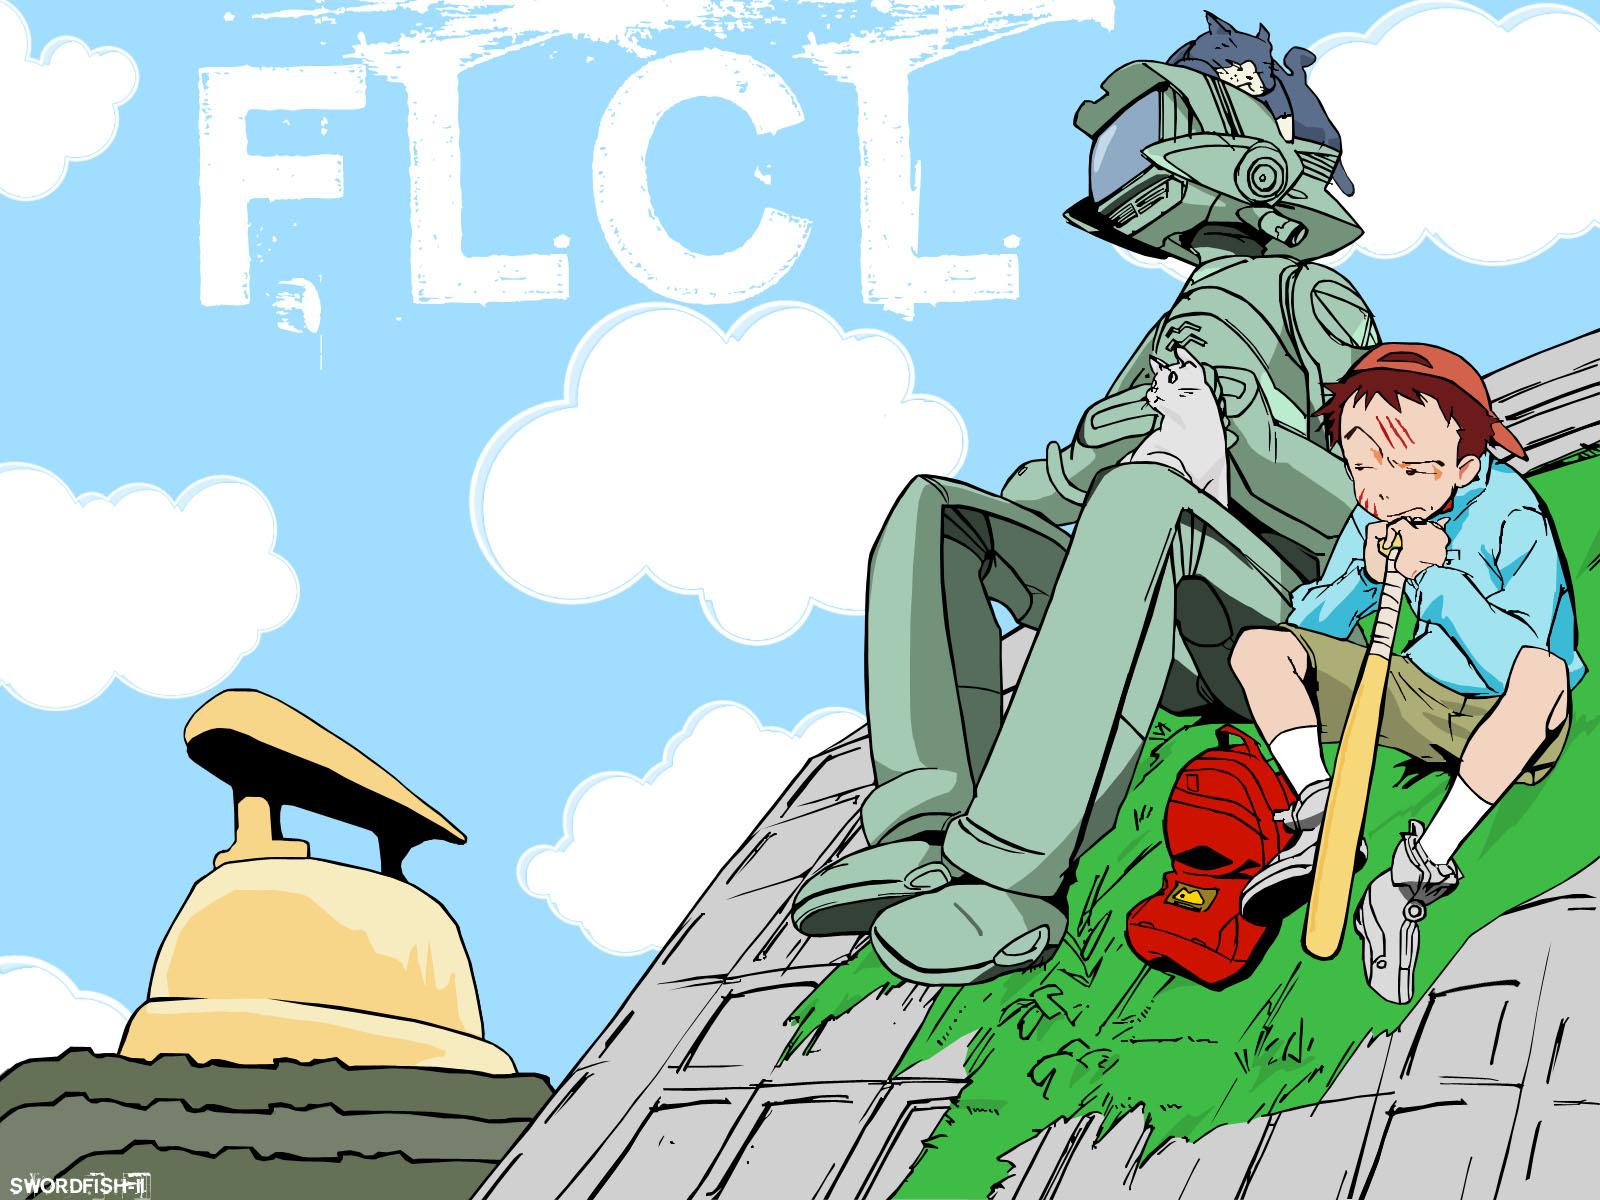 Flcl game wallpaper 02 imagez only - Flcl wallpaper ...